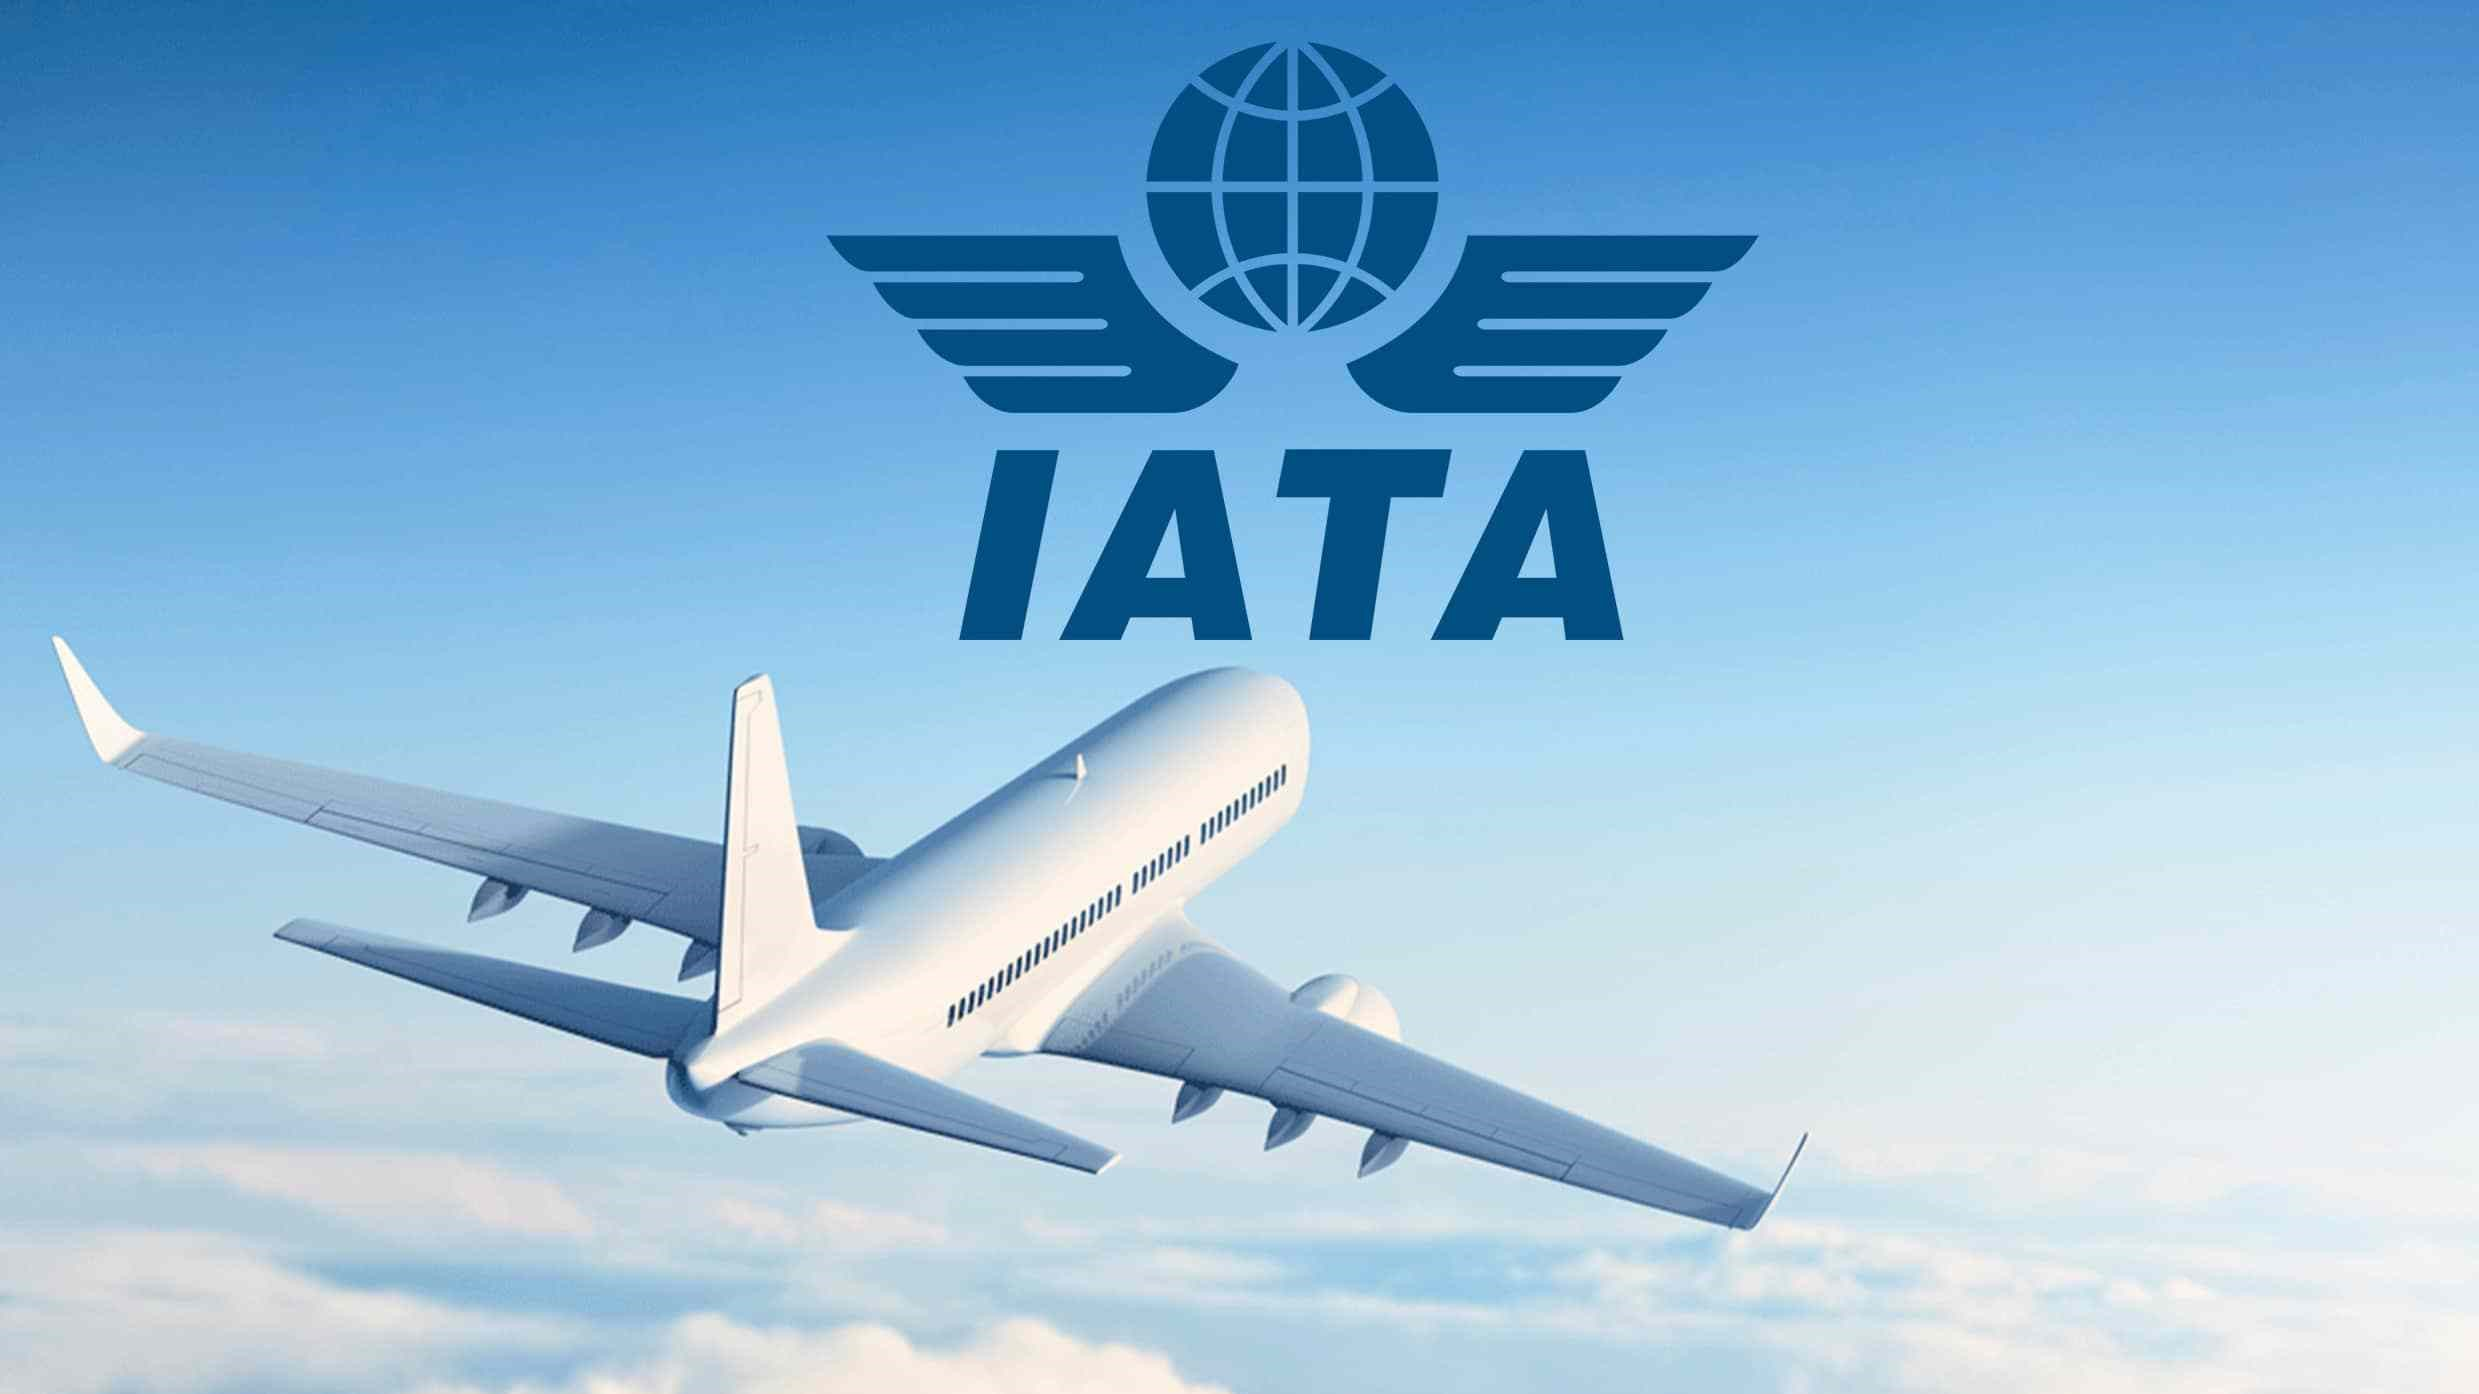 FoxATM - IATA